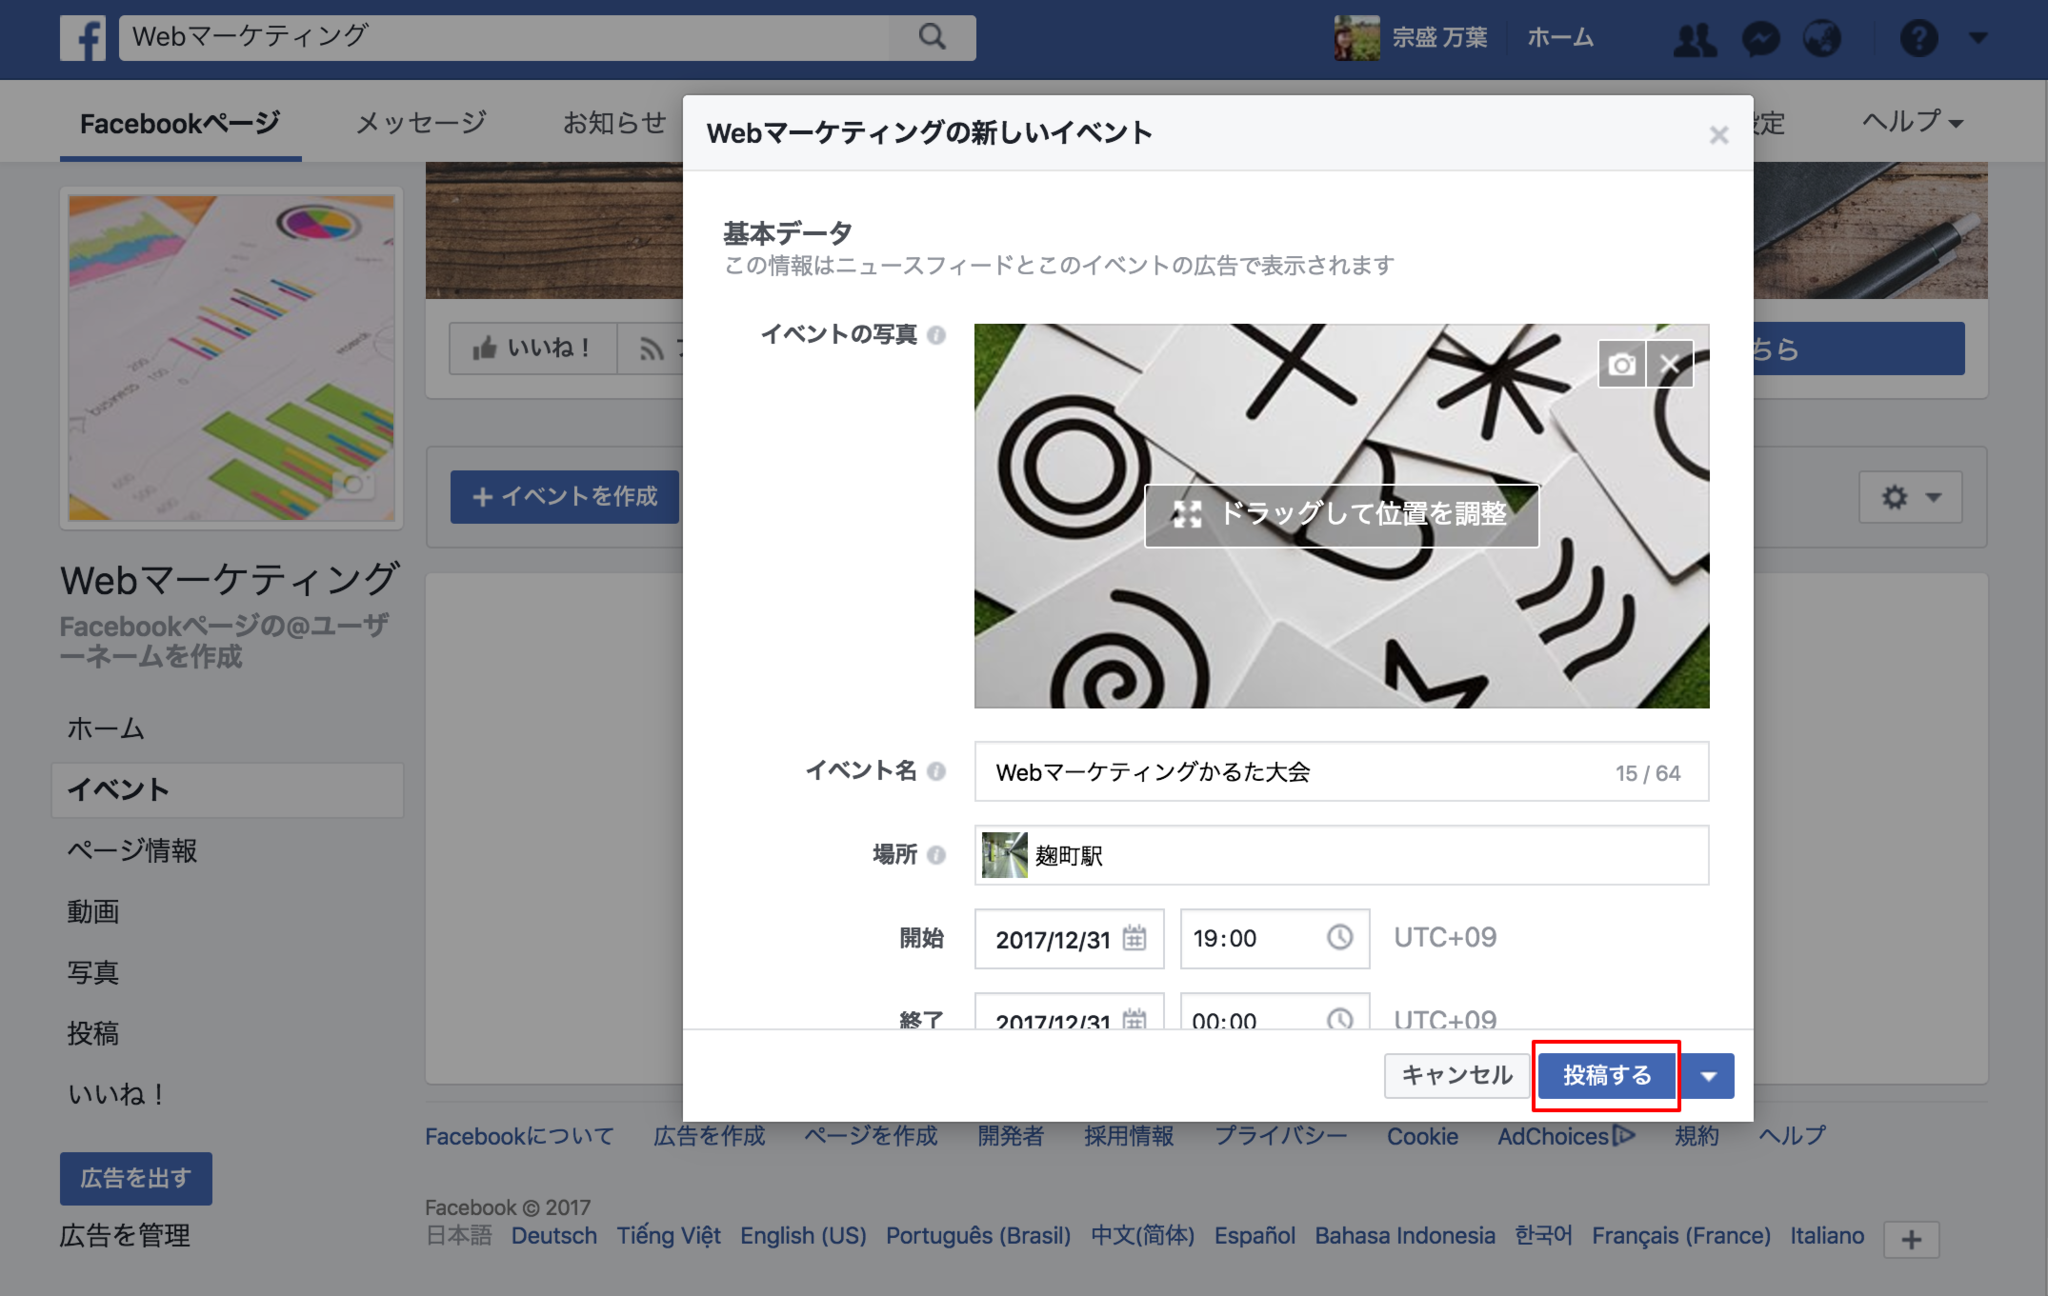 Webマーケティング___イベント_(2).png